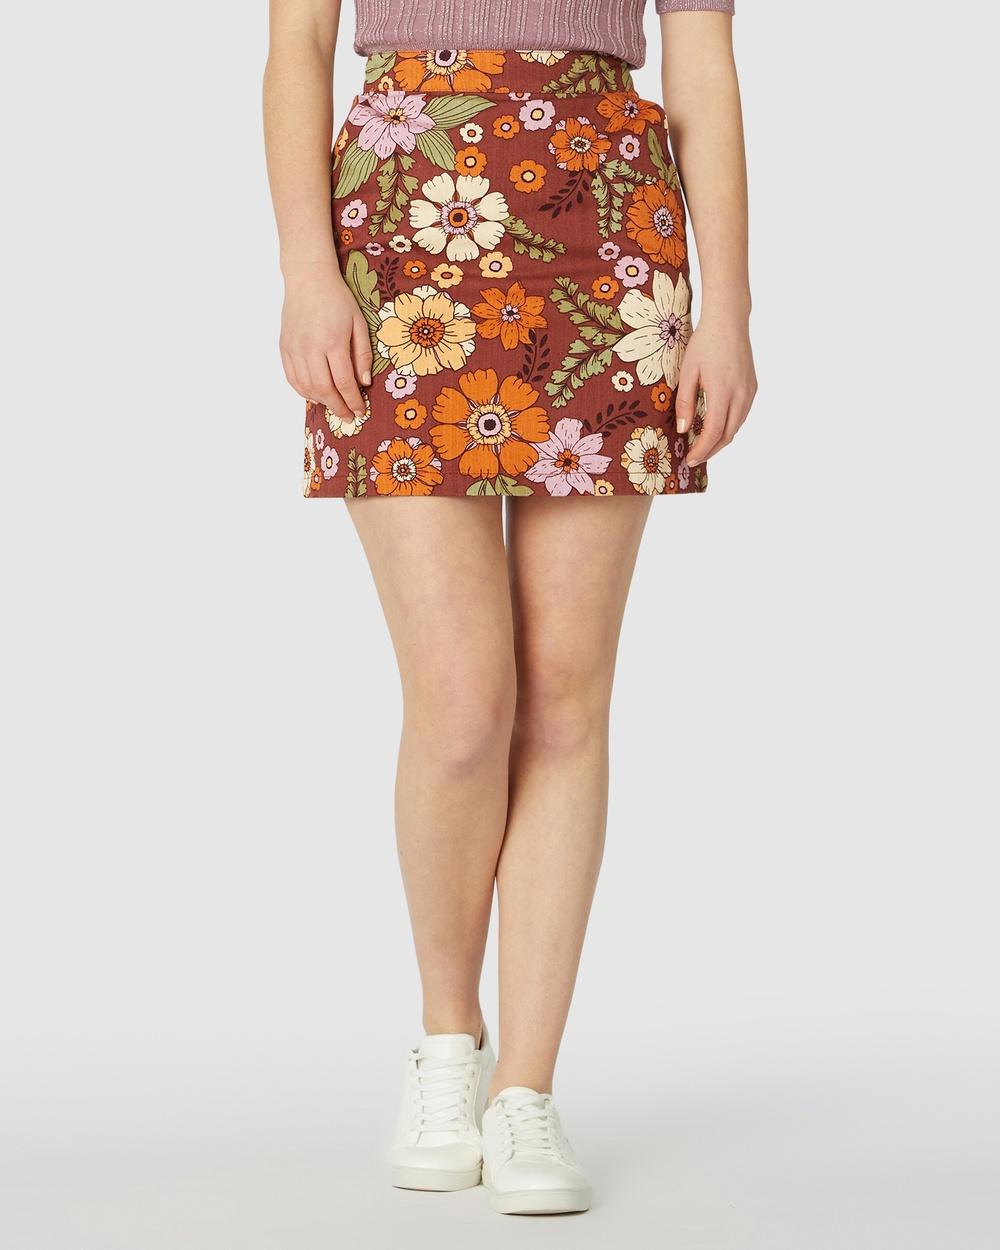 Princess Highway Brandy Mini Skirt Skirts Brown